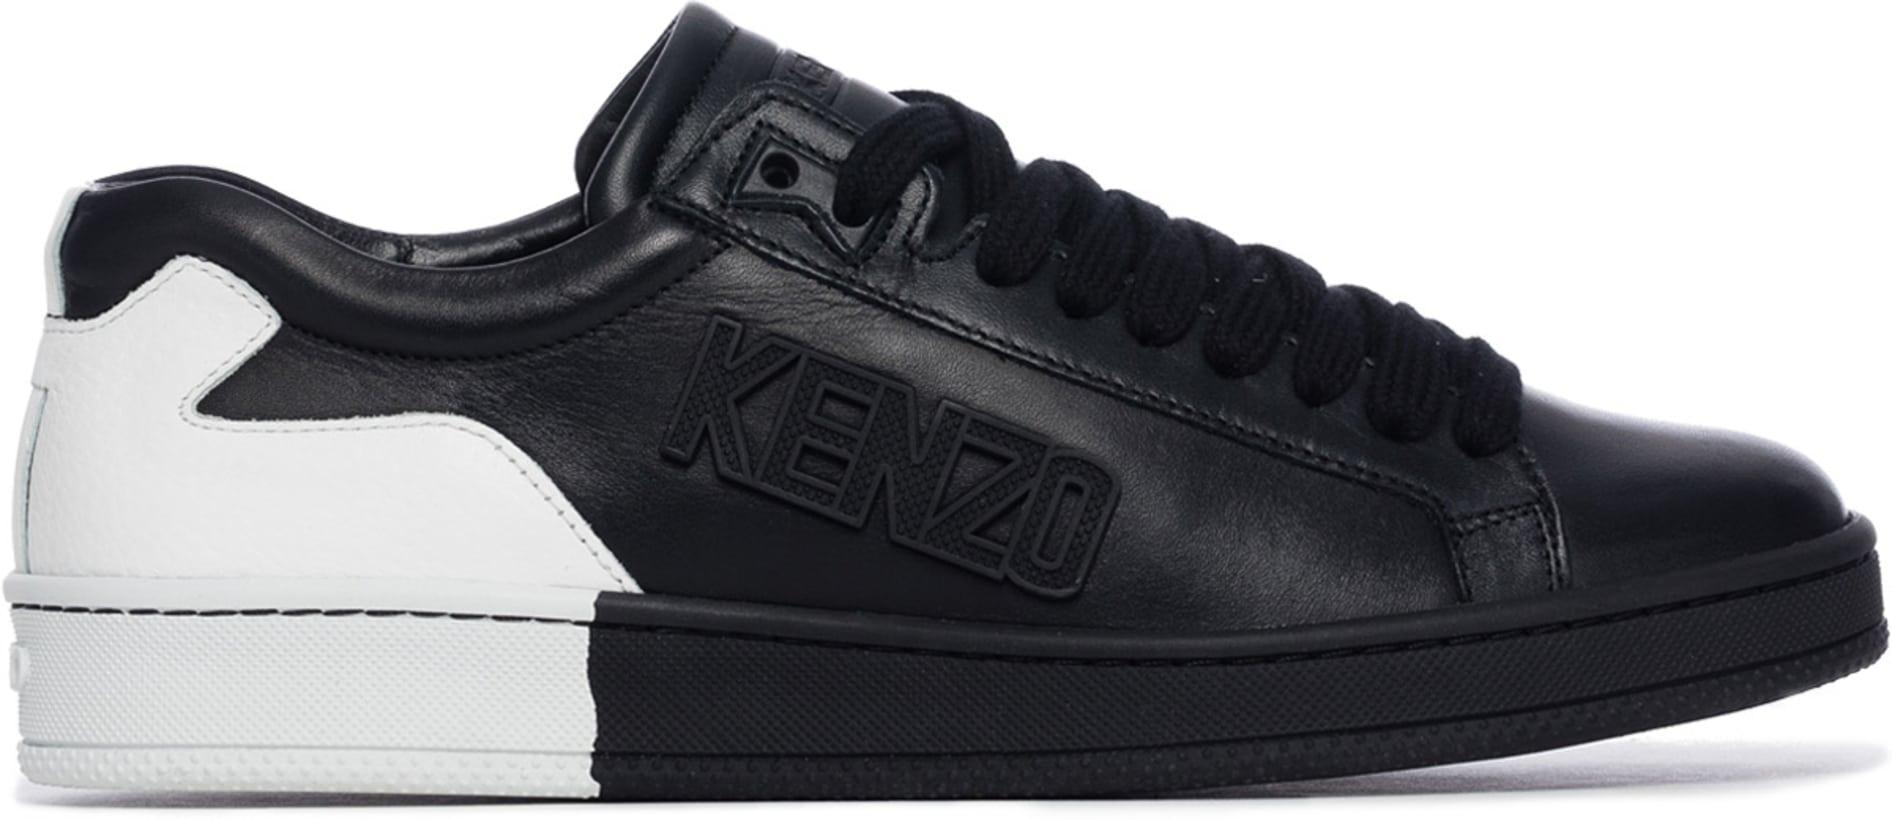 Kenzo Tennix Basket Bicolor Black